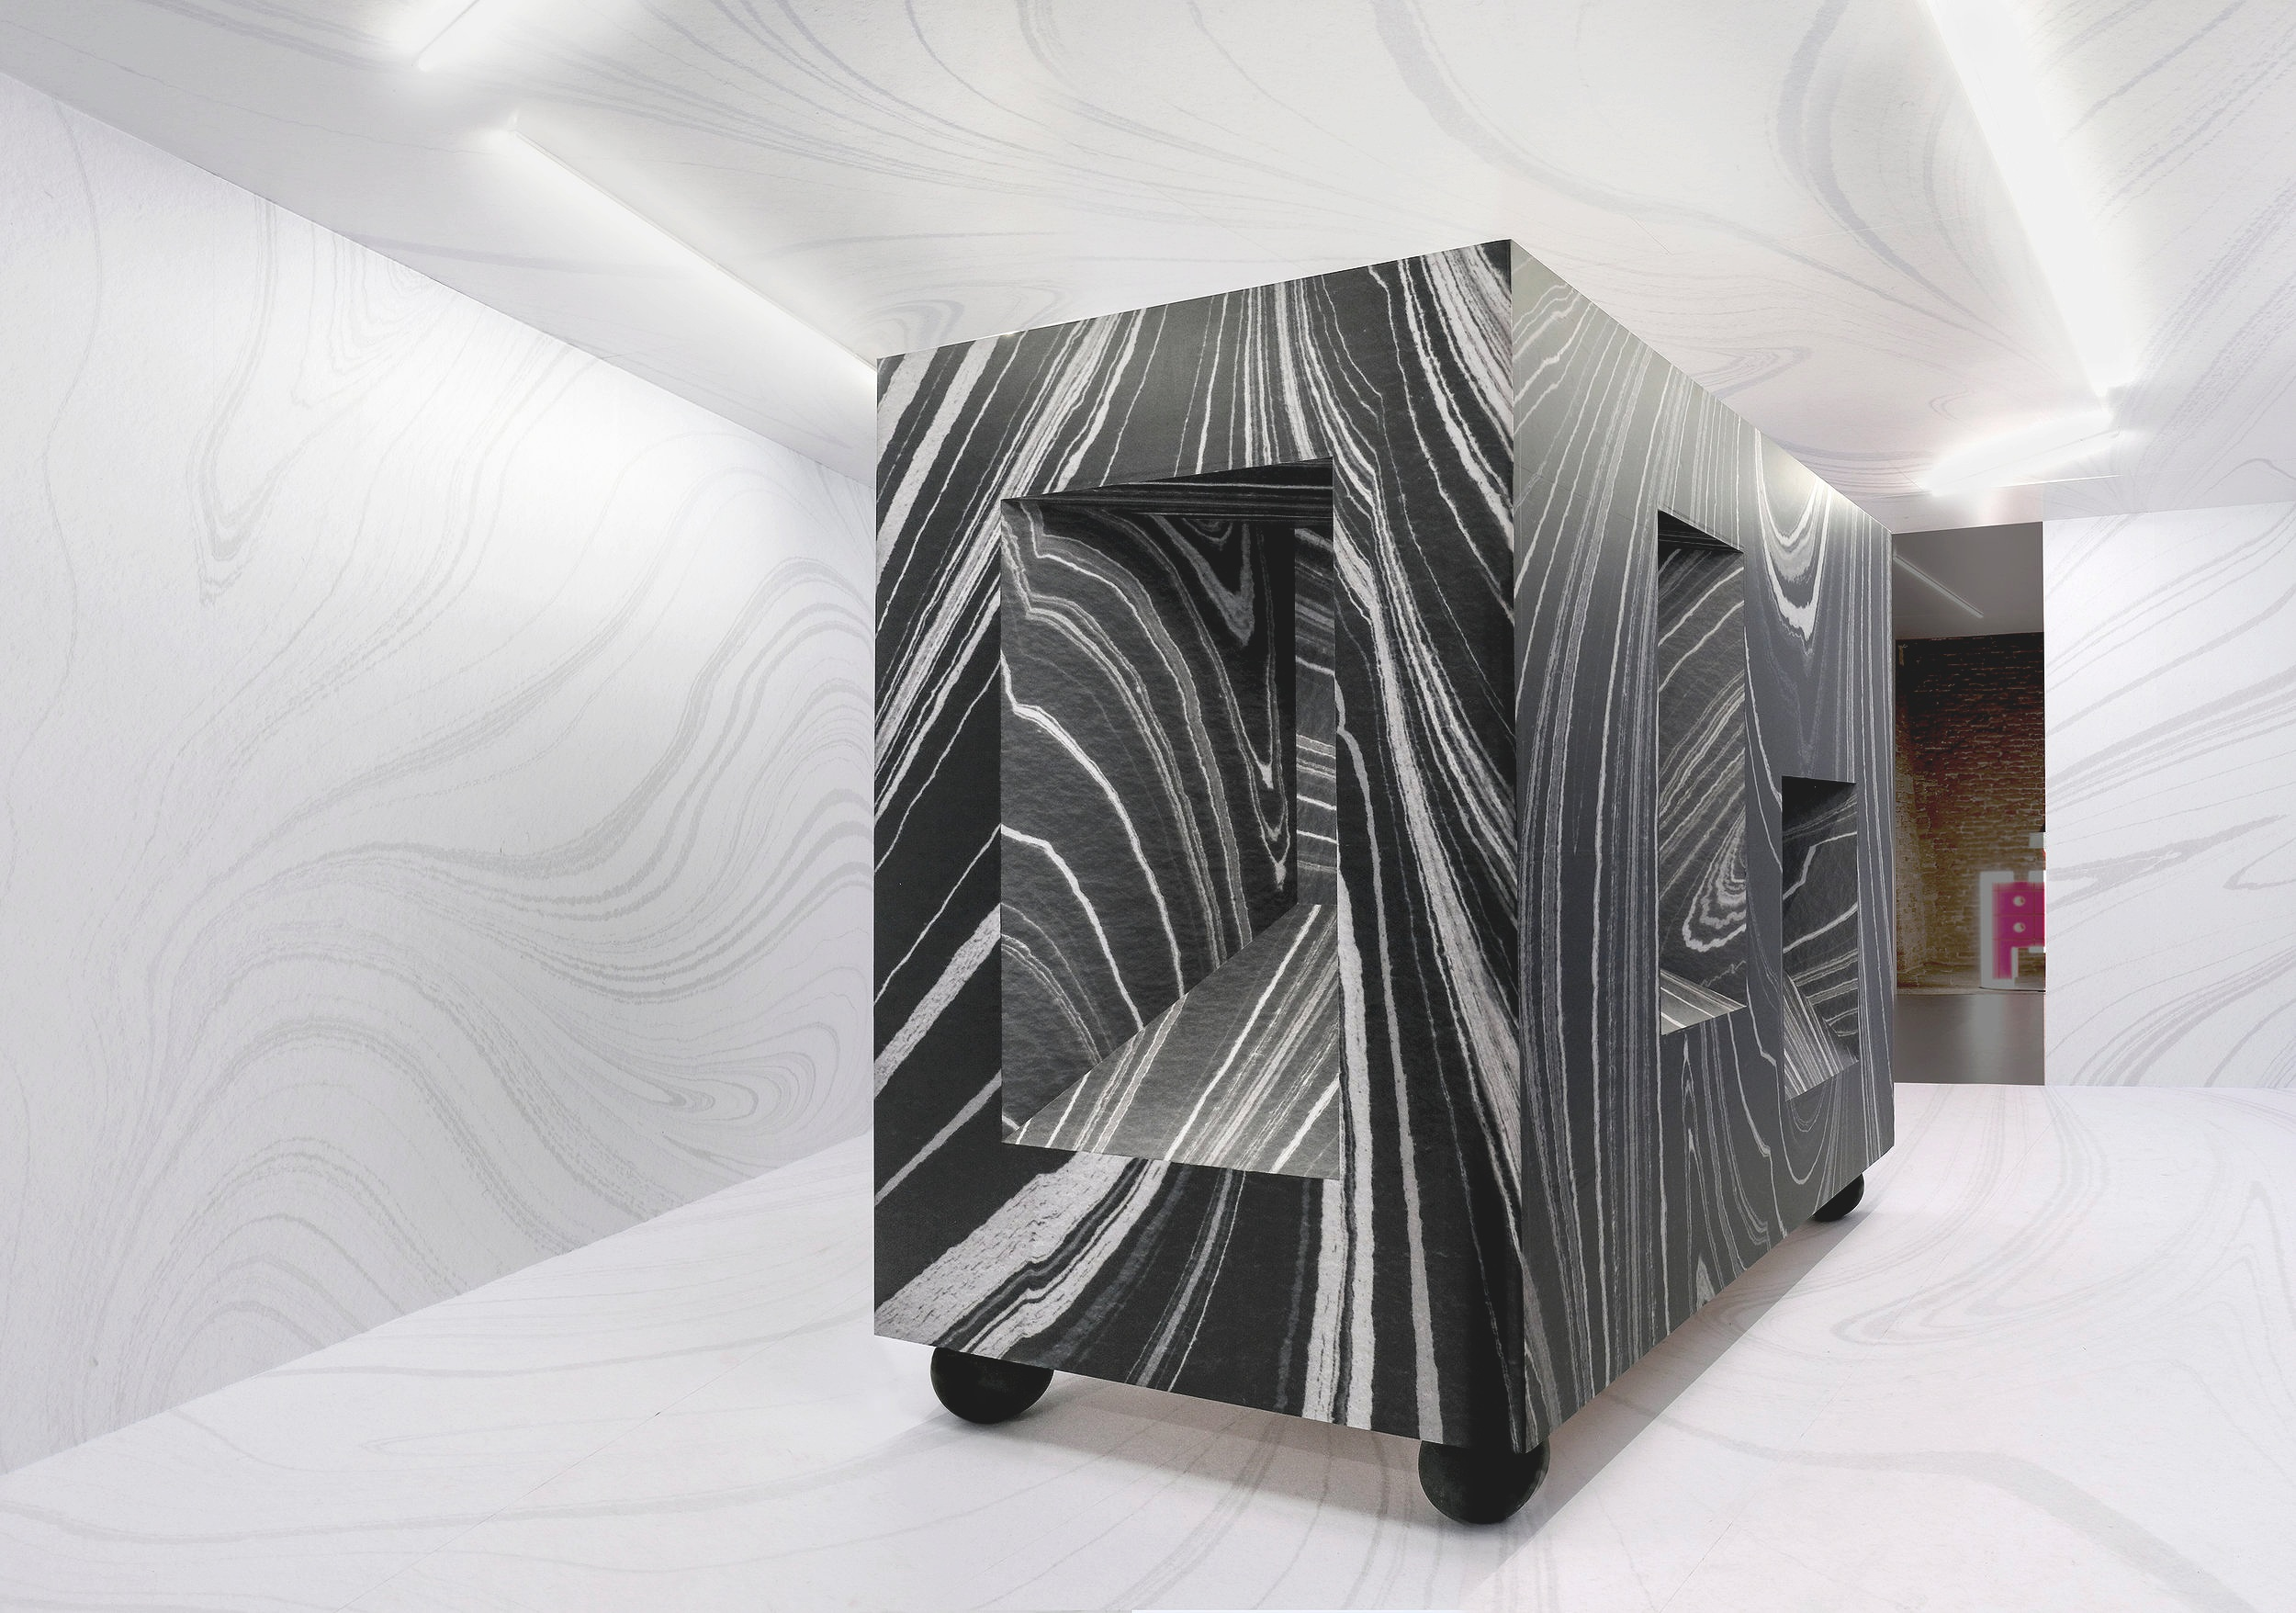 Cenotaph, 2019 Installation within Peter Halley's Heterotopia I, Venice, Italy